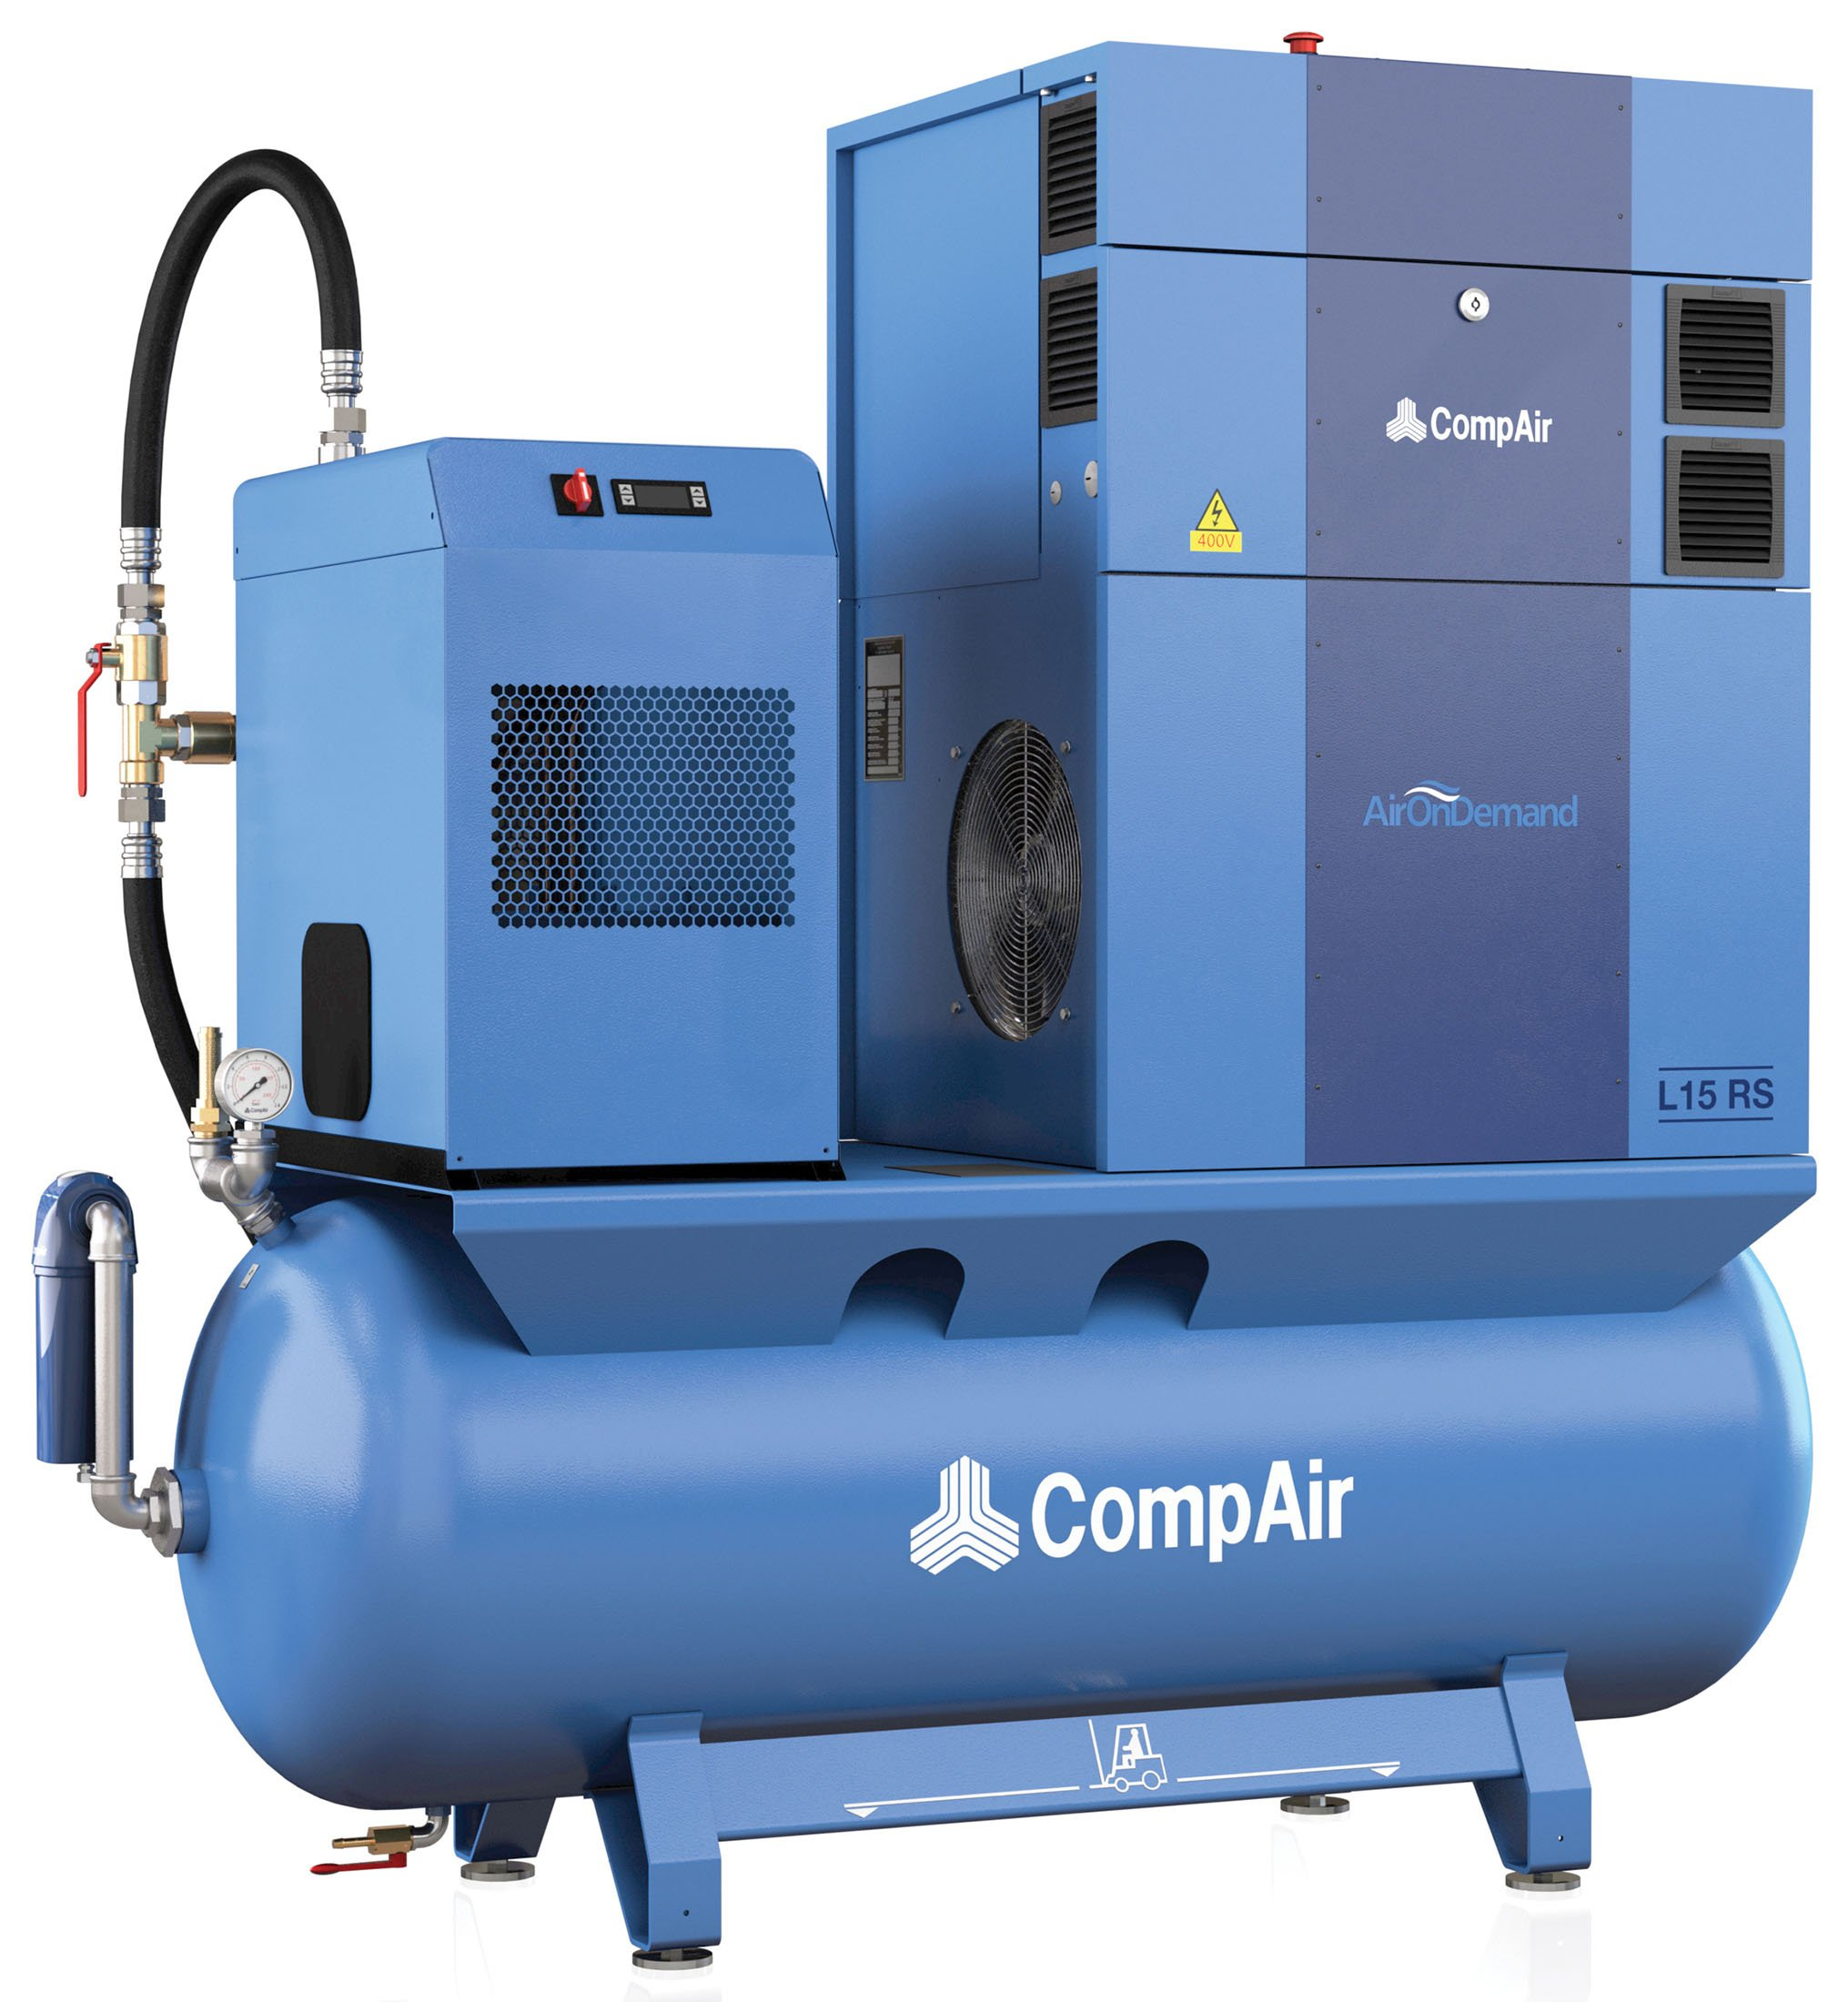 Midlands UK supplier of CompAir L15RS AirStation air compressor